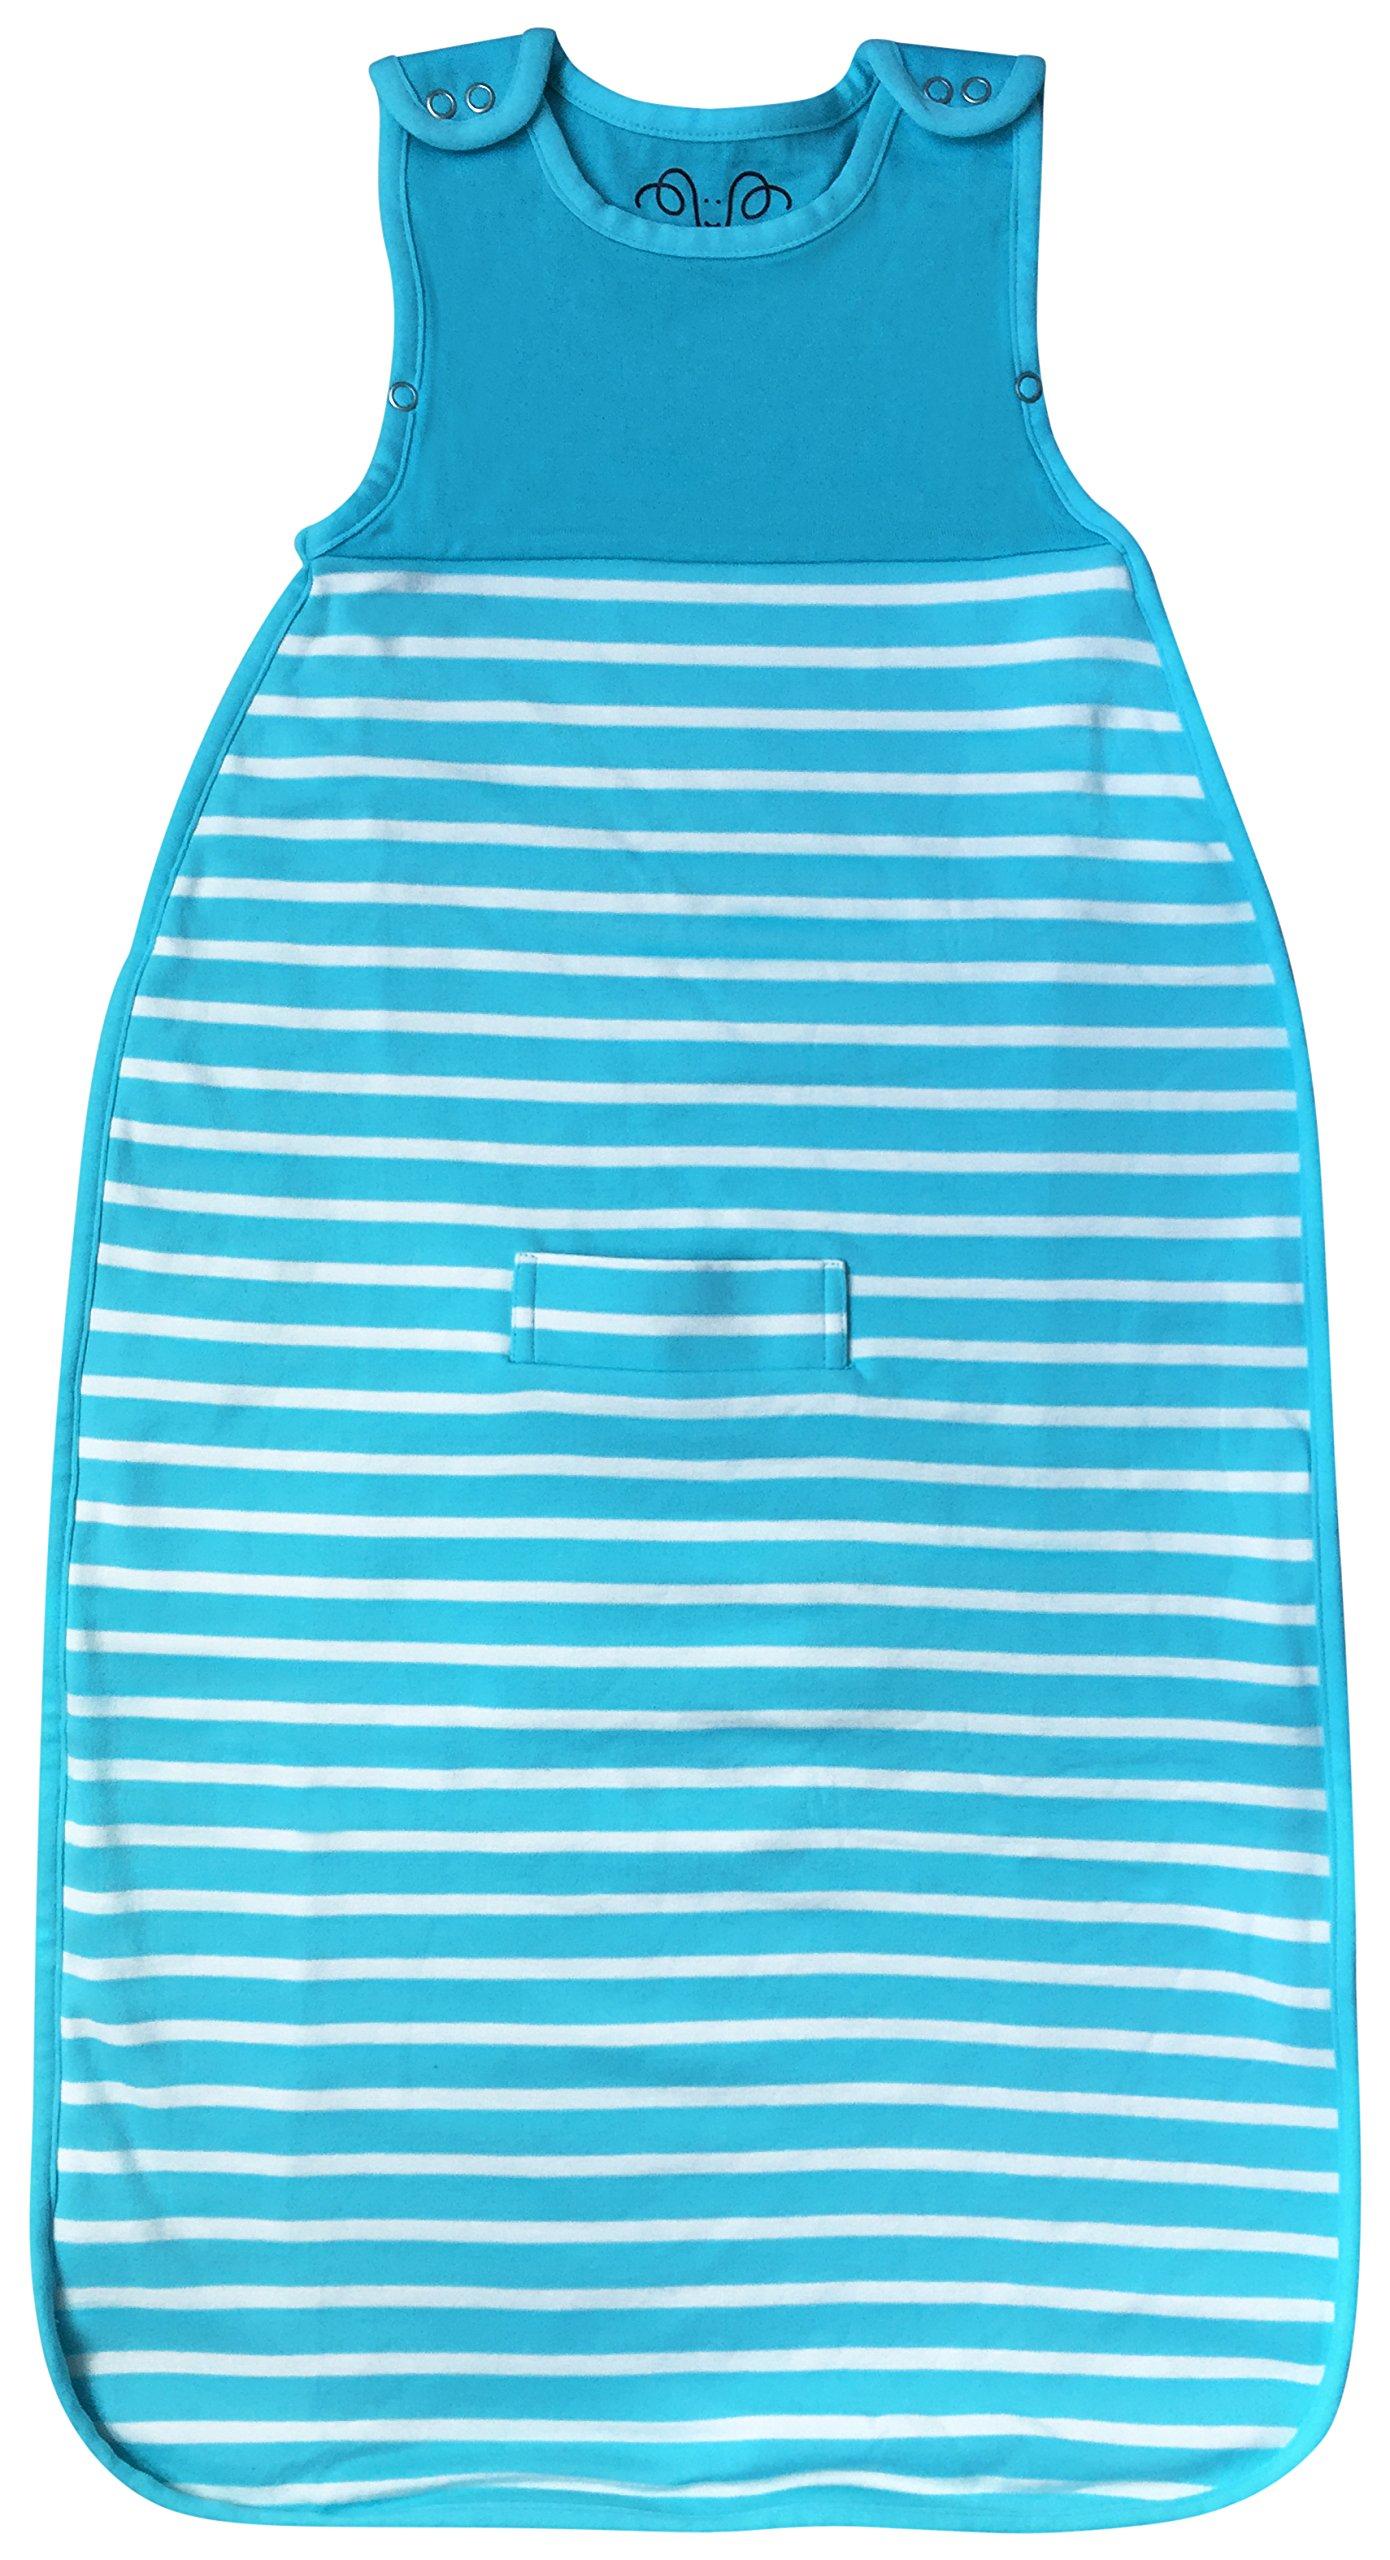 Antipodes Merino Baby Sleeping Bag – Infant and Toddler Sleep Bag Sack - Wool and Organic Cotton (Aqua)